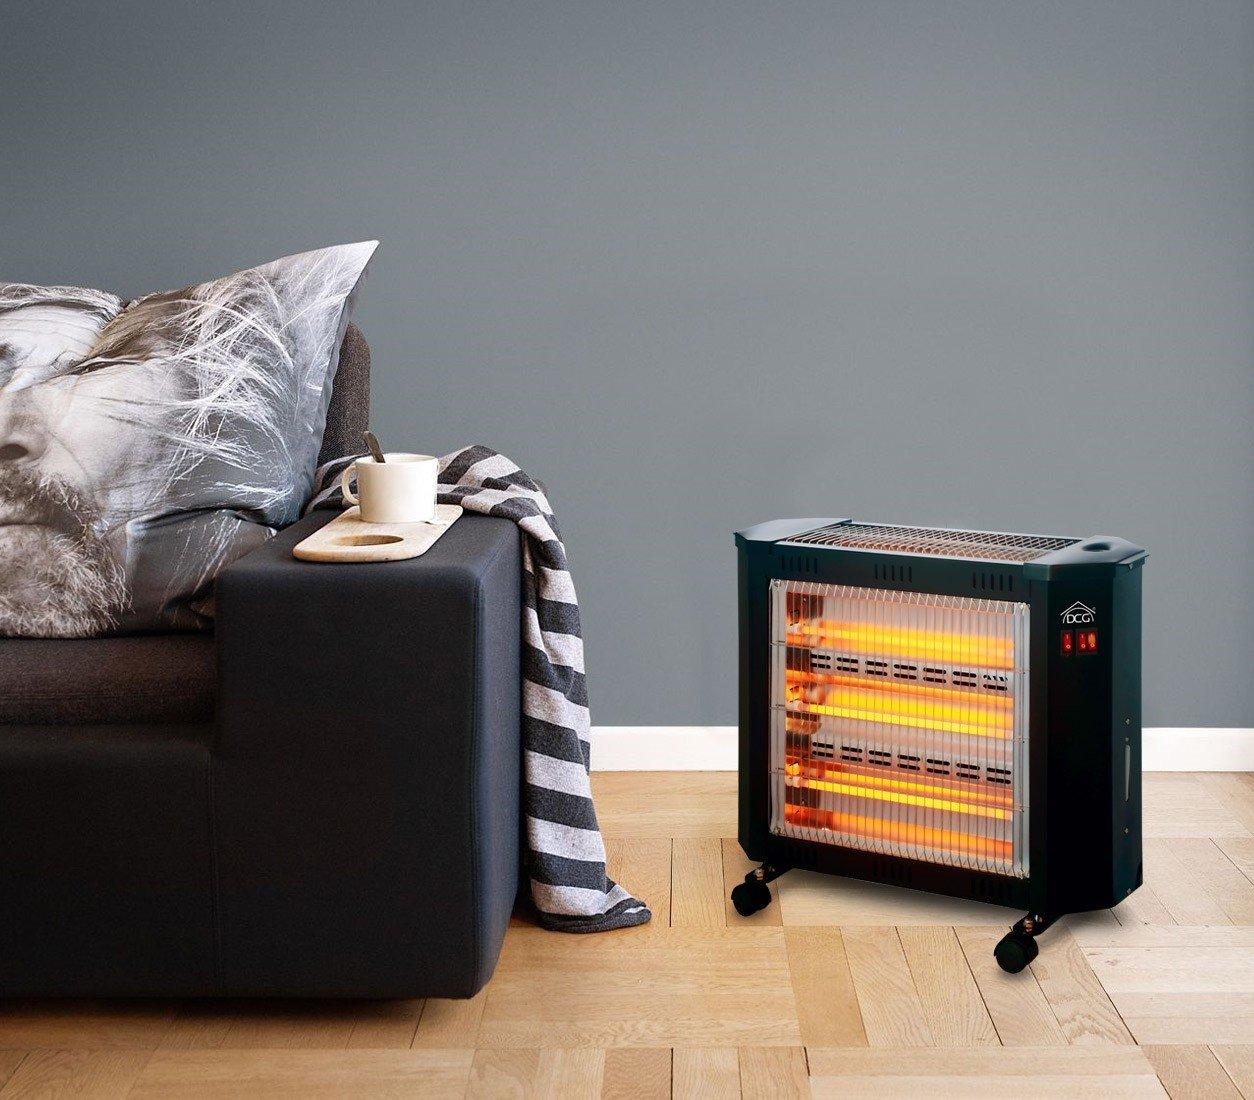 SA9624 Estufa Eléctrica DCG cuarzo 4 elementos humidificador 3 niveles temperatura. Media Wave Store®: Amazon.es: Hogar